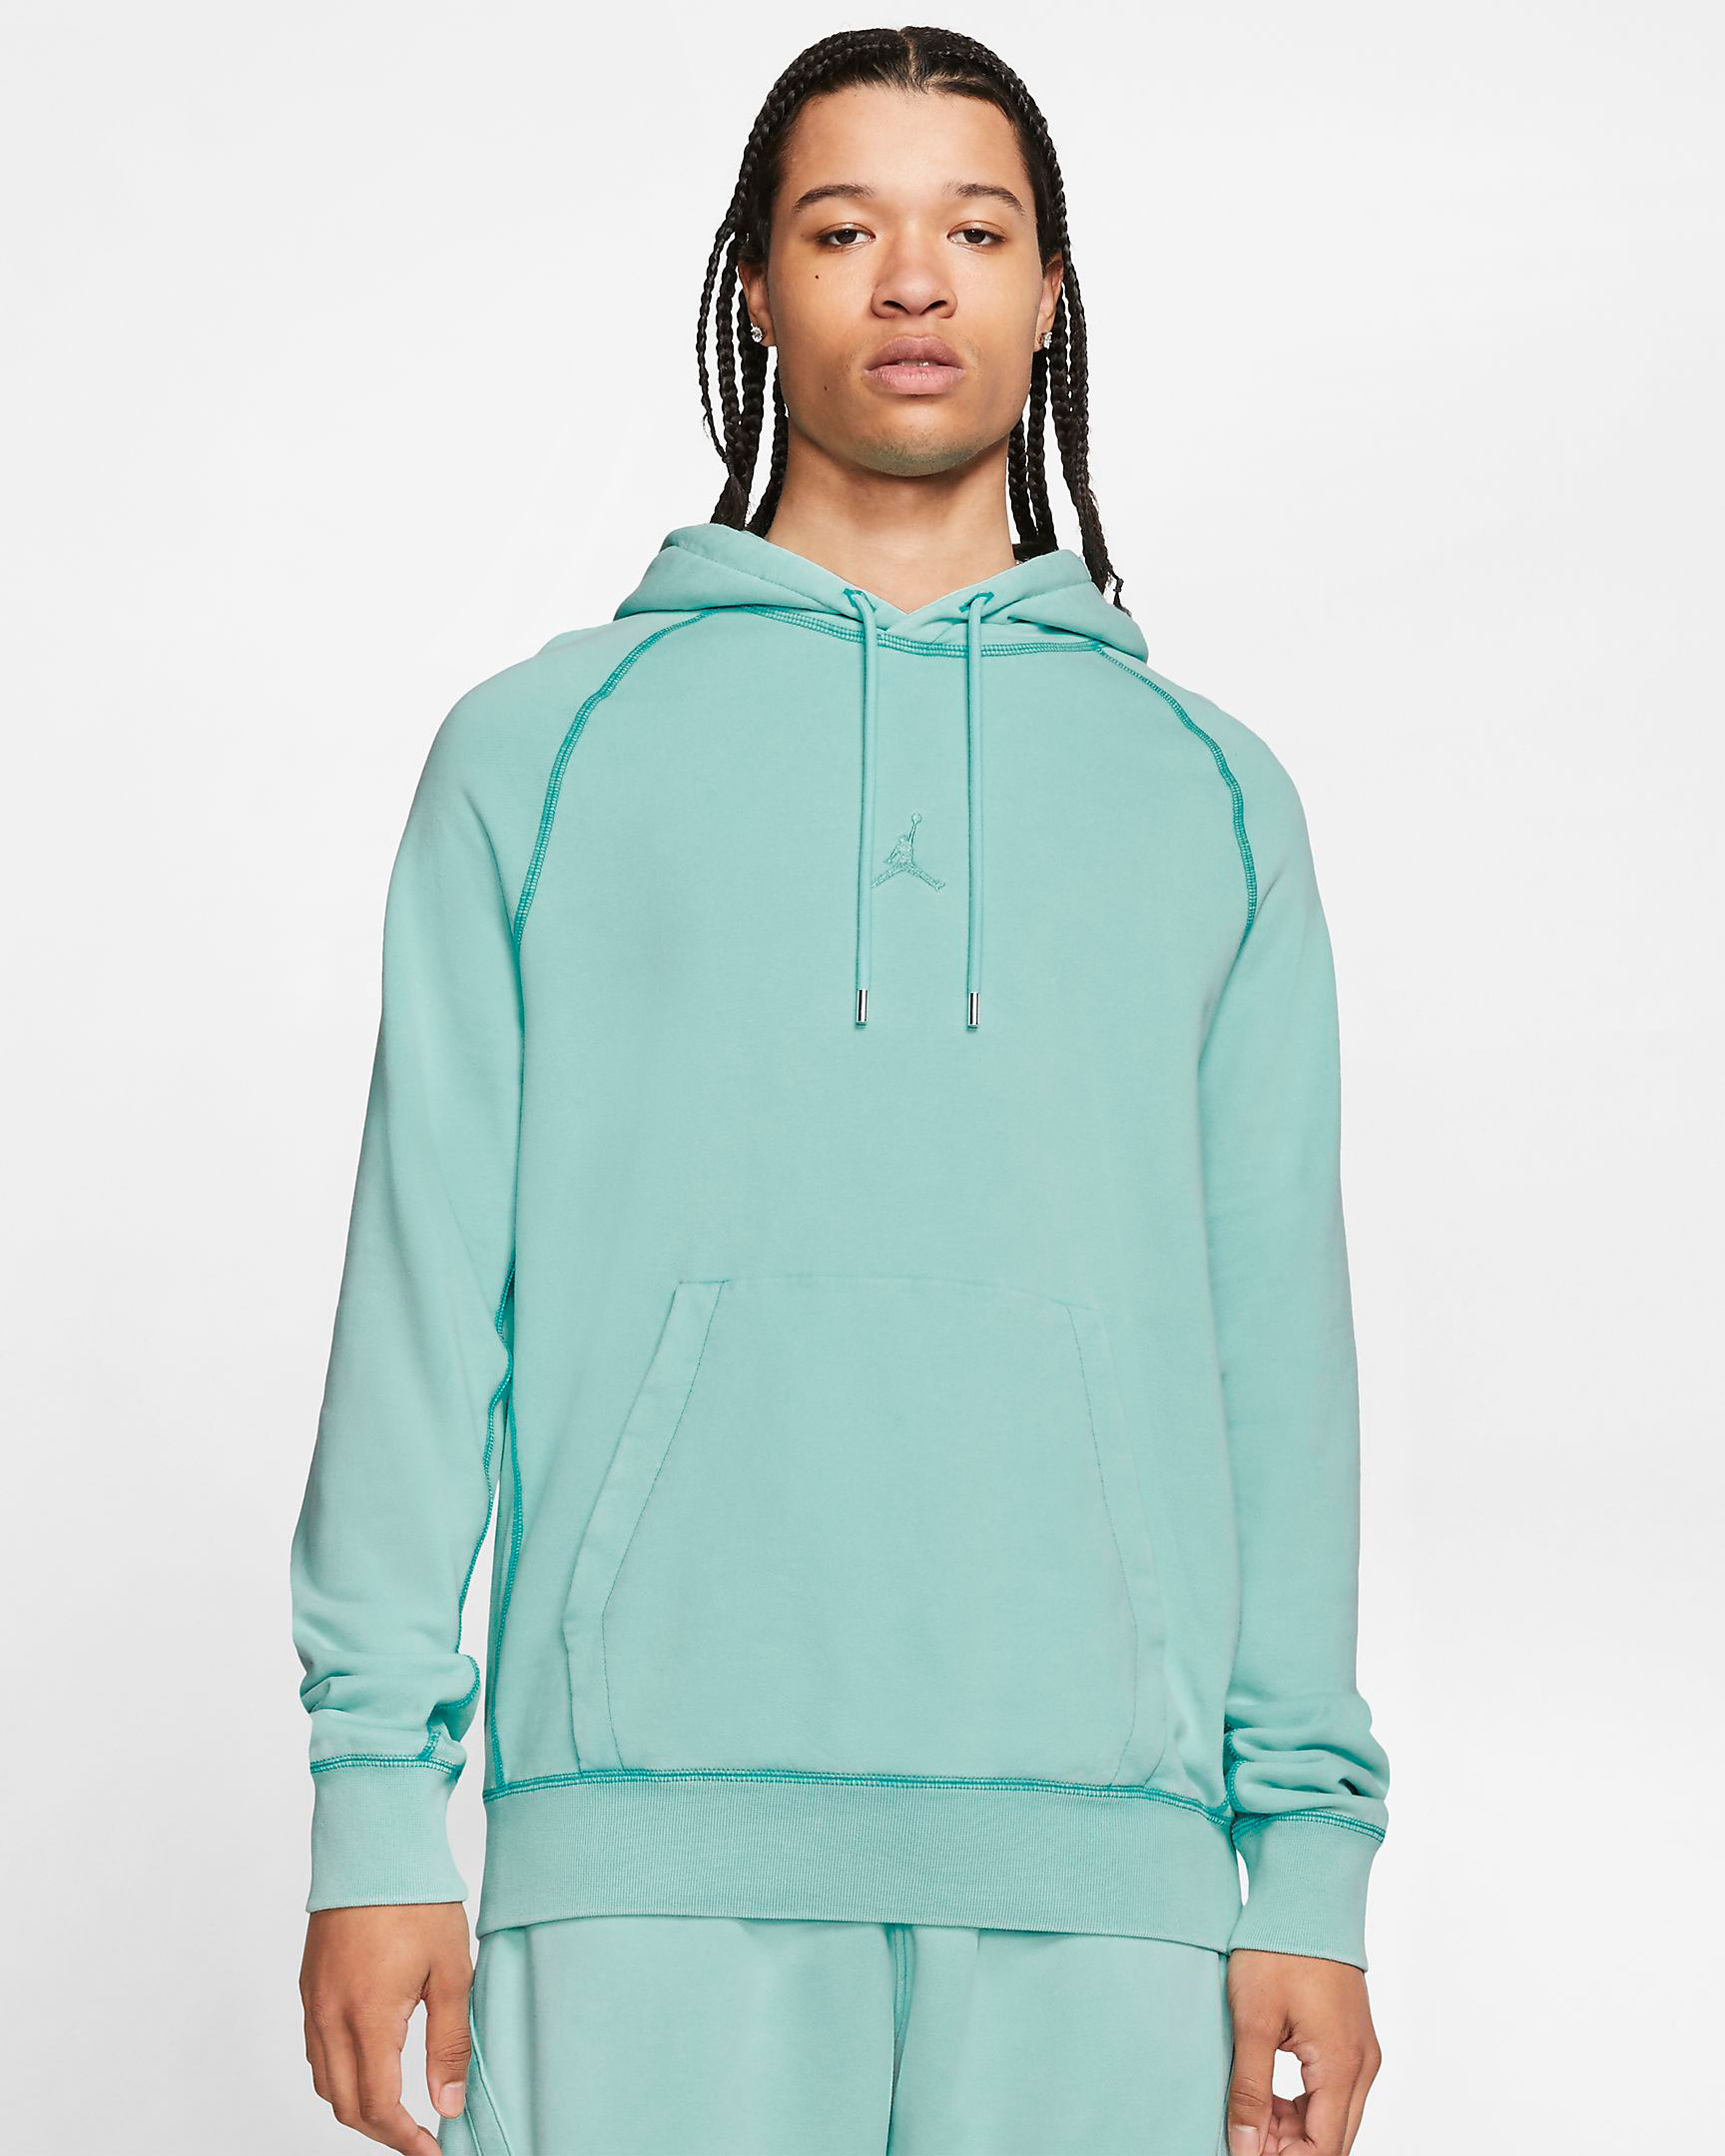 jordan-1-bio-hack-hoodie-match-aqua